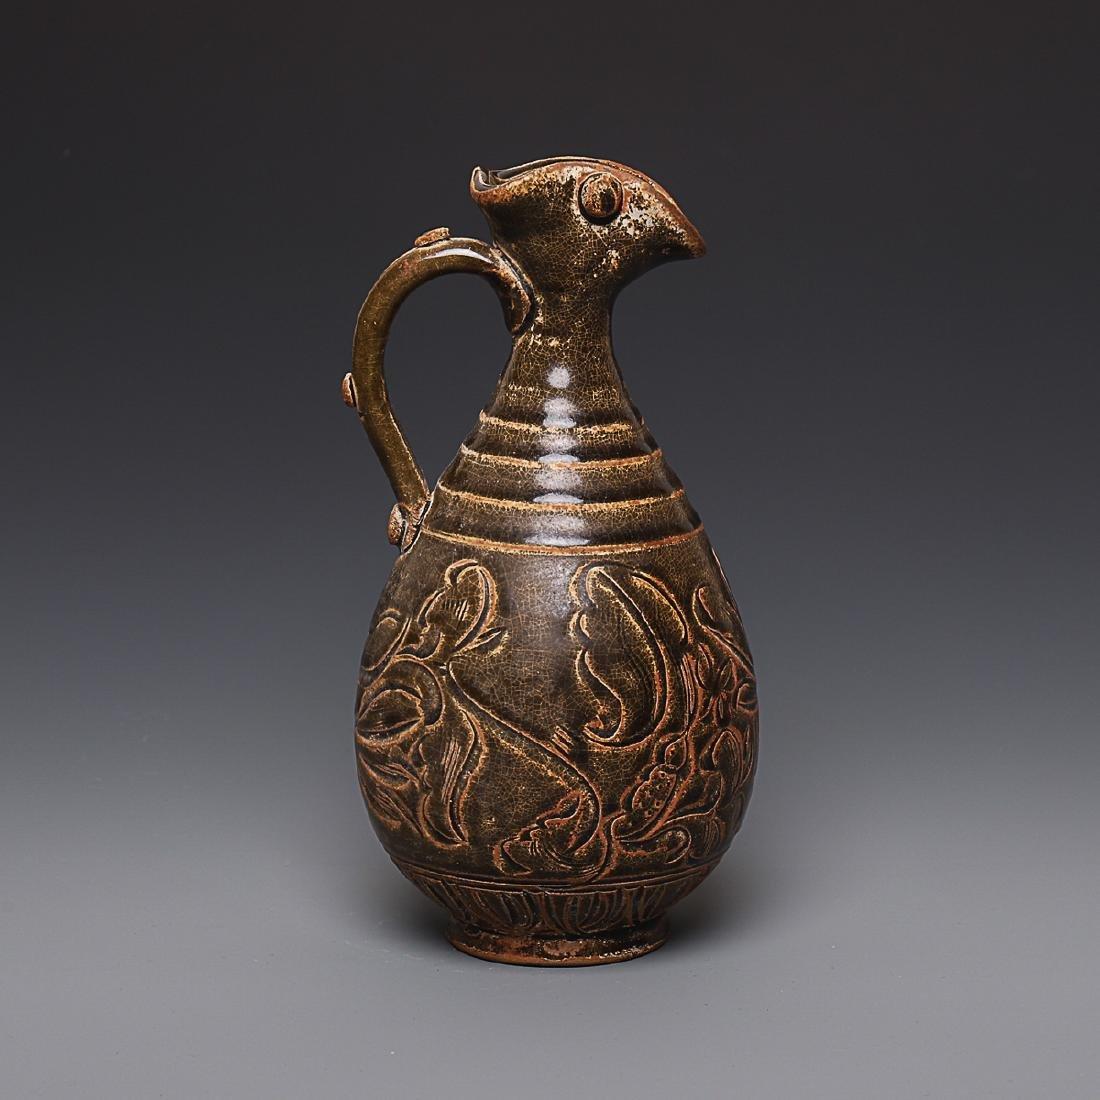 Vintage Chinese Porcelain Pot